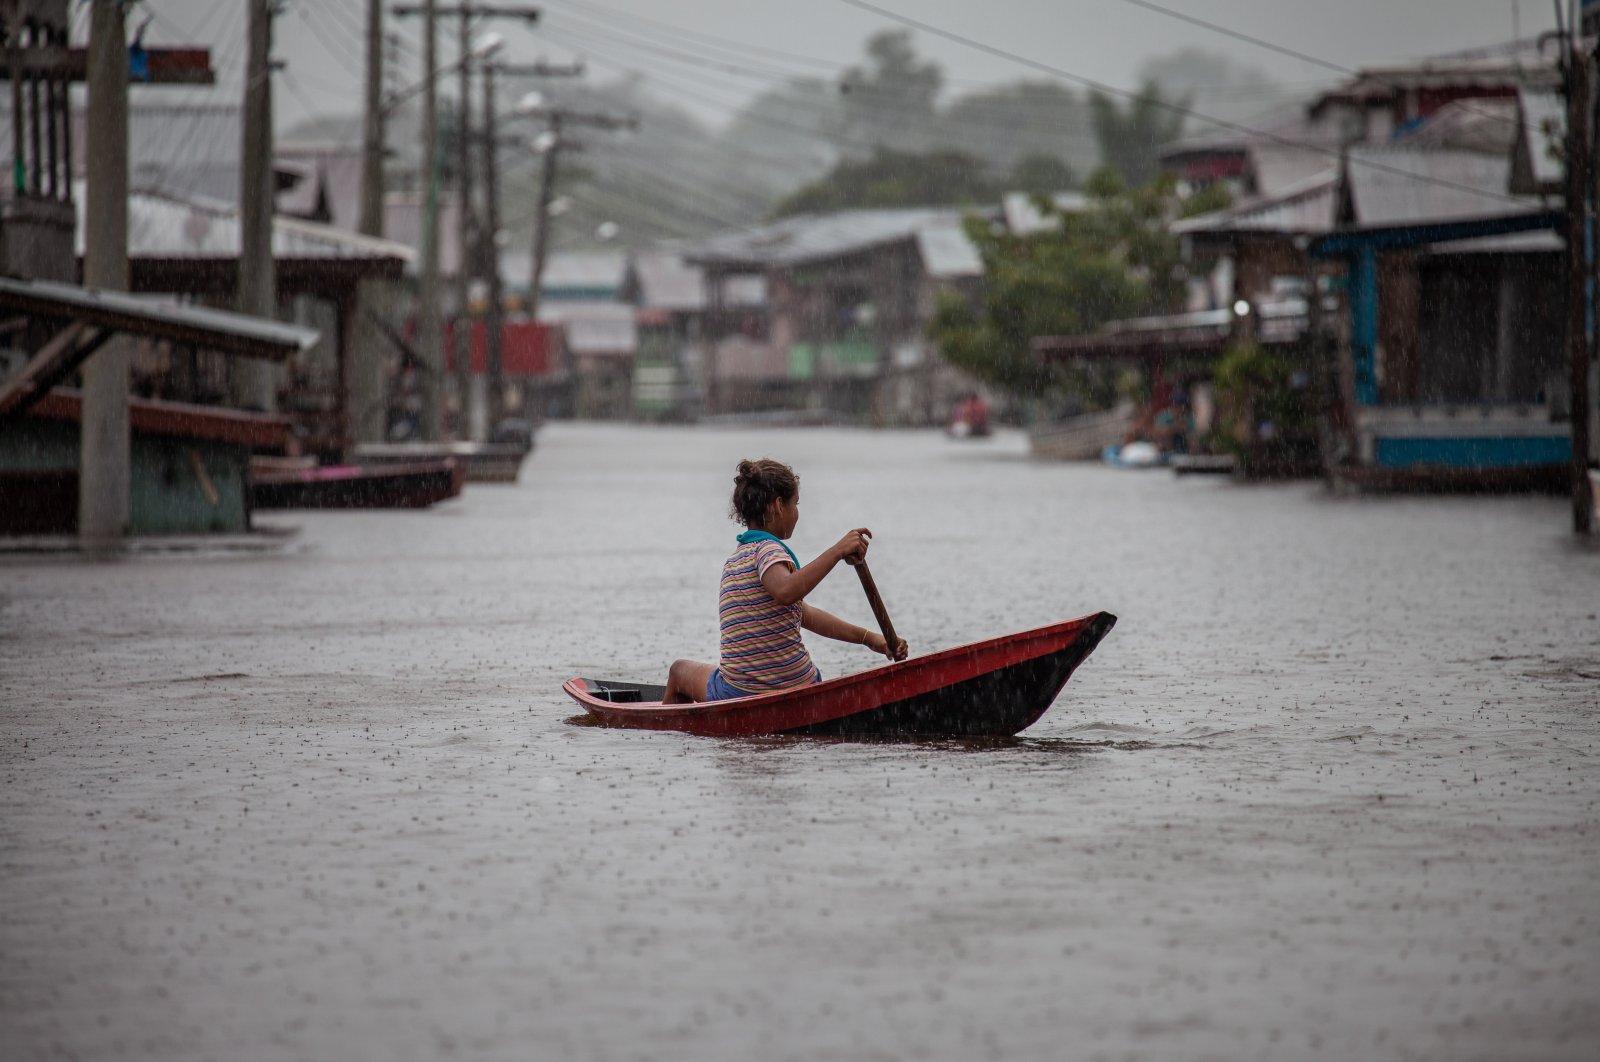 A girl paddles a small canoe through flooded streets n Anama, Amazonas, Brazil, May 23, 2021. (EPA Photo)